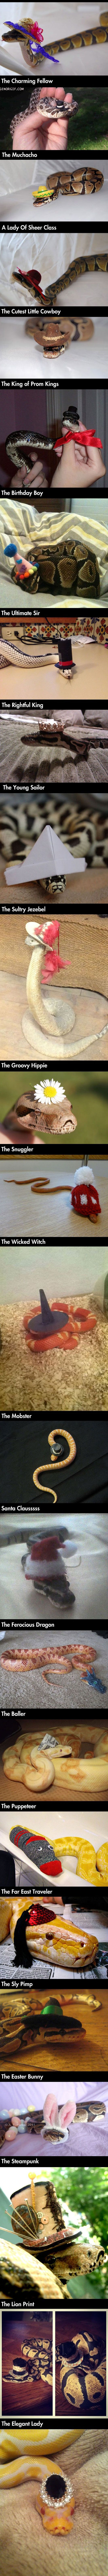 joindarkside » Snakes In Hats! (26 Pics)